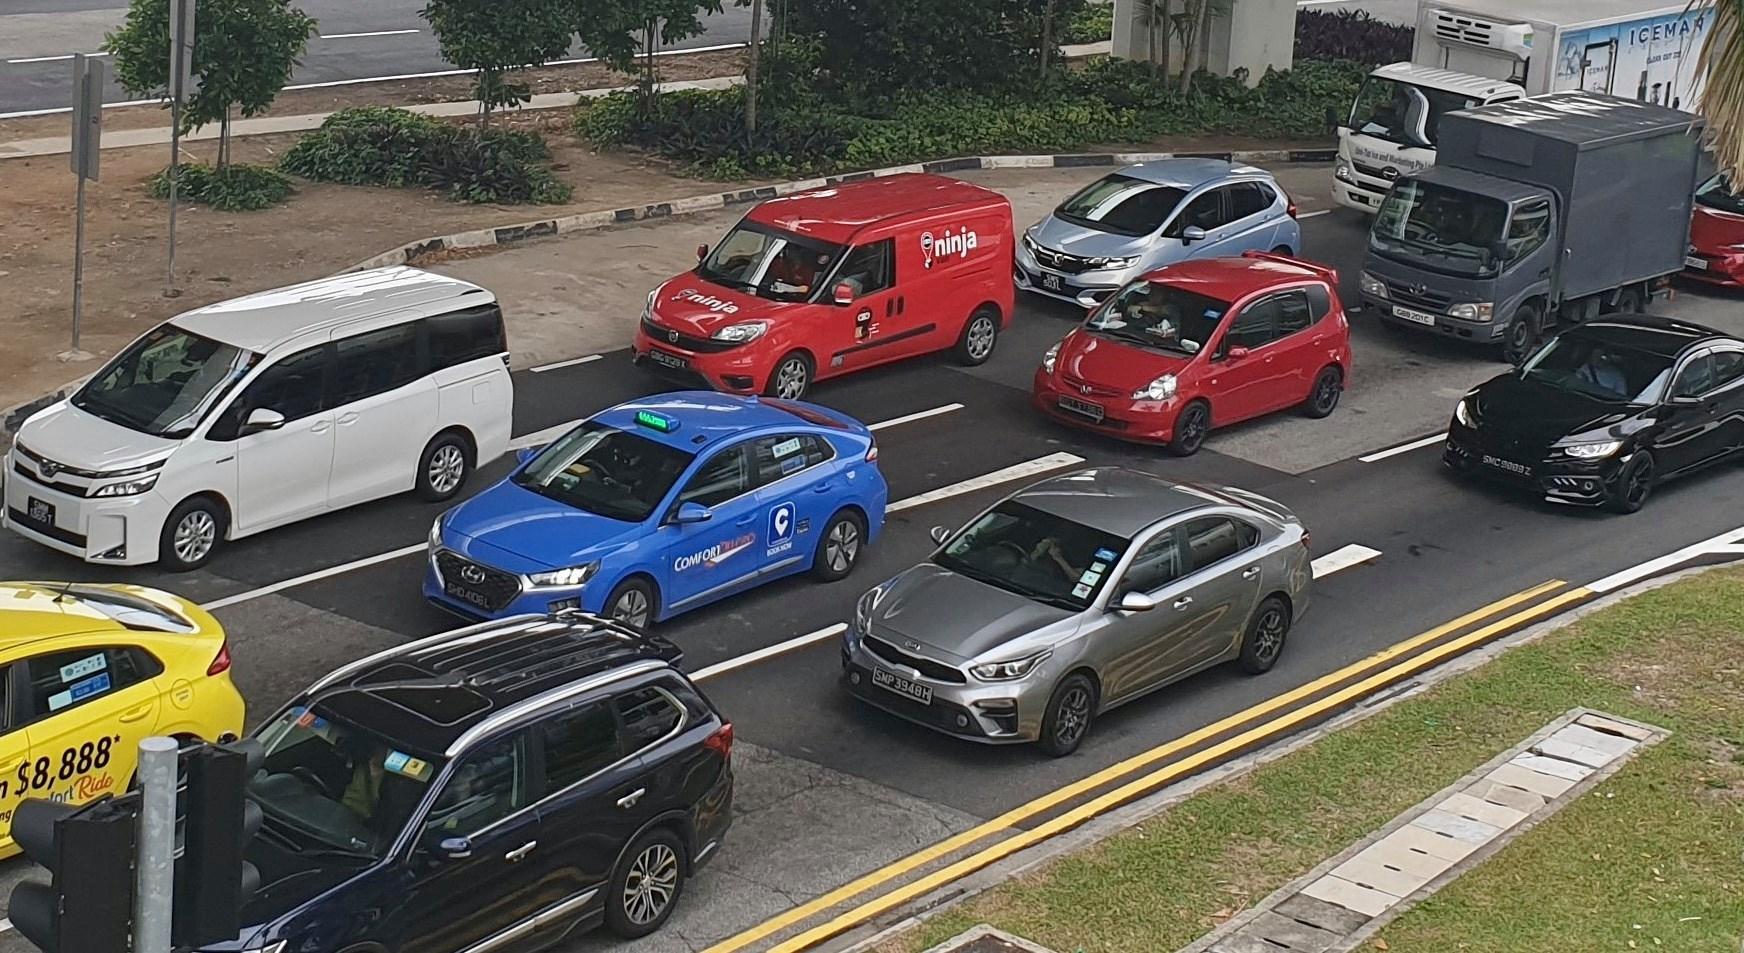 Photo courtesy: Khaw Boon Wan Facebook